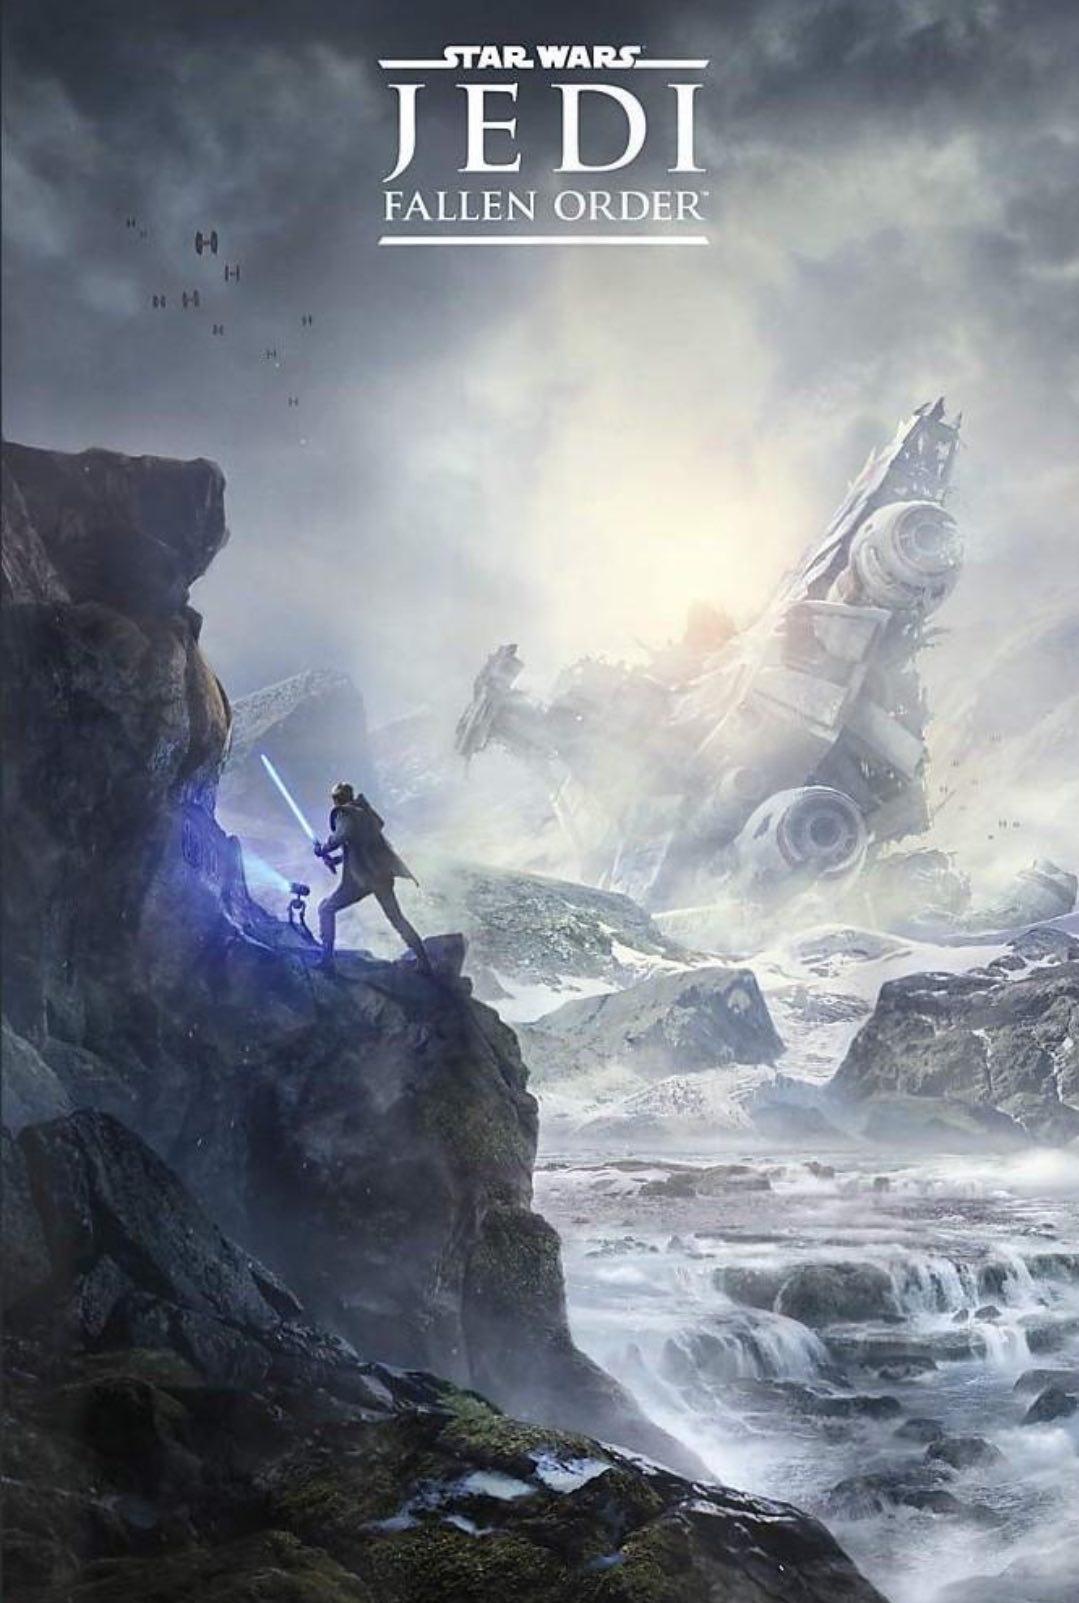 star-wars-jedi-fallen-order-poster.jpg